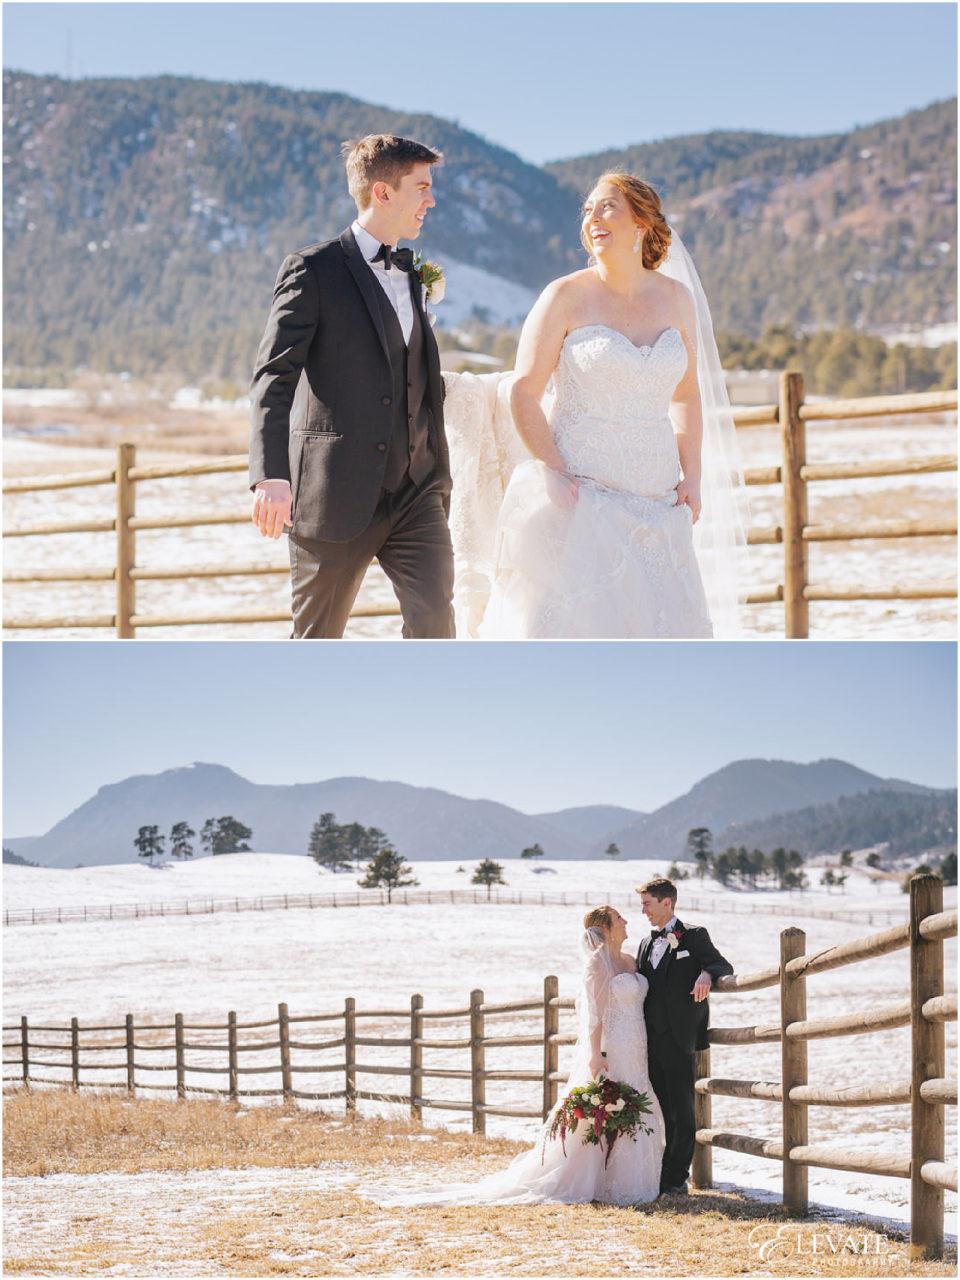 spruce mountain ranch winter wedding